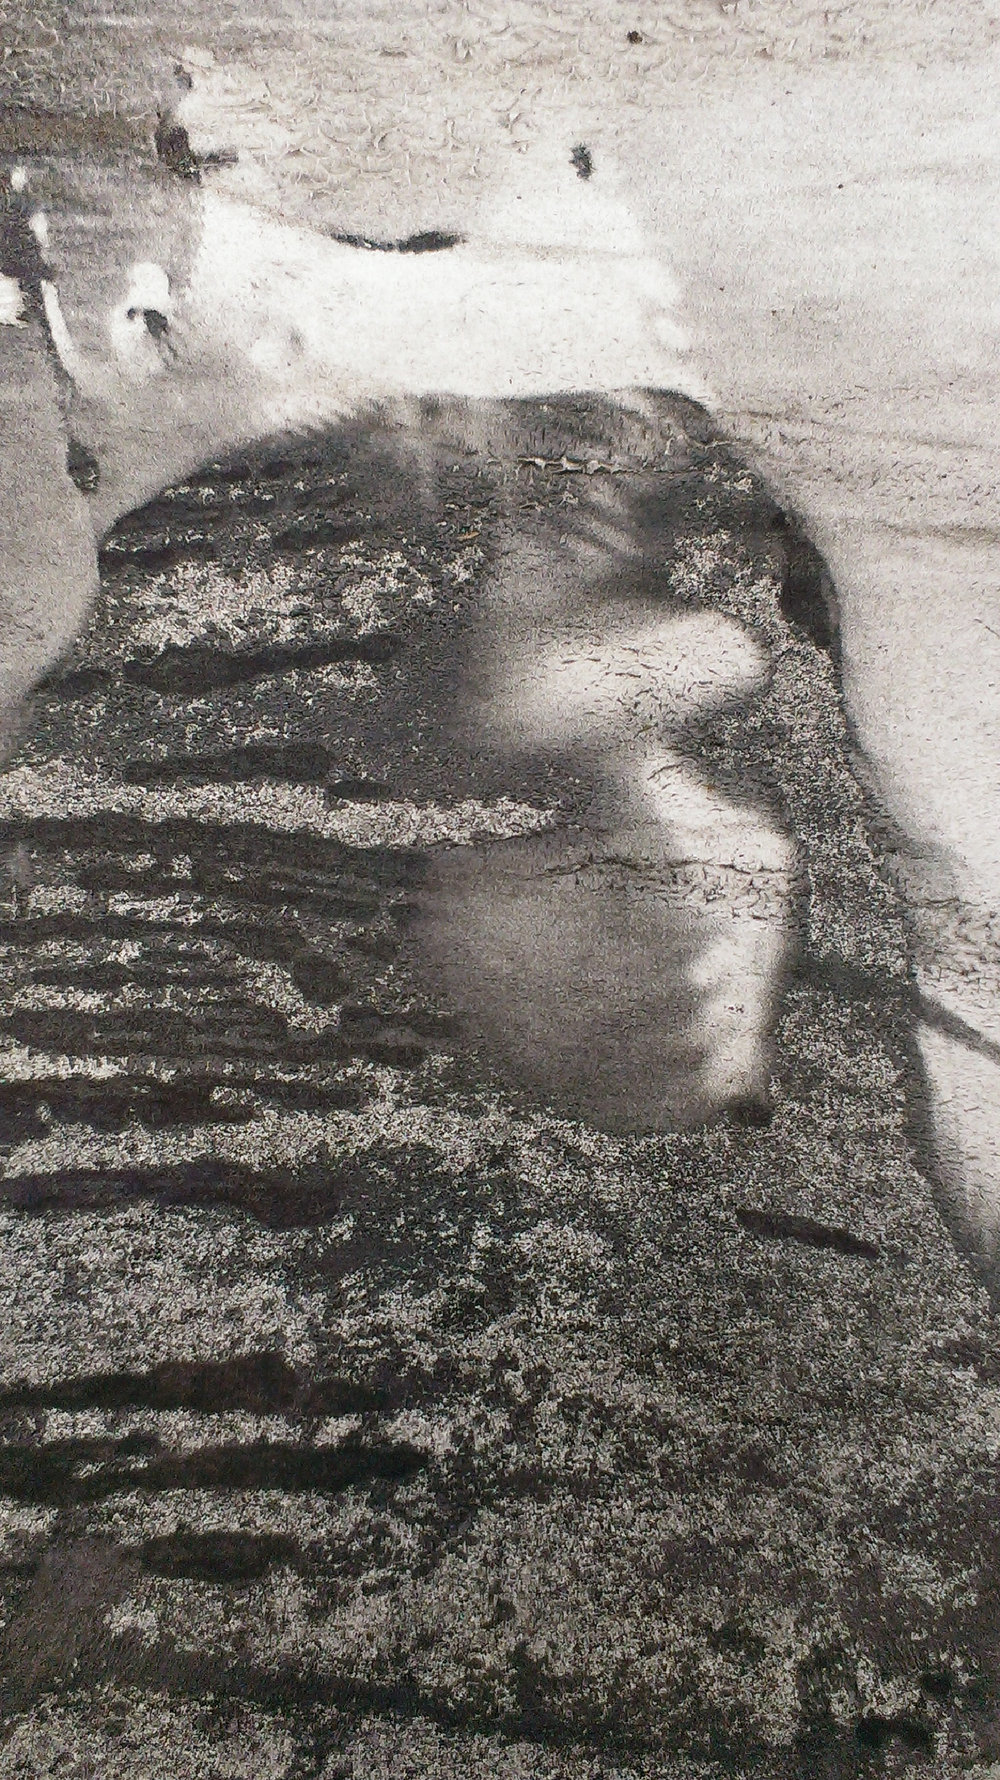 Copy of Denham Carr_Queenie_Archival Photo Print_25x14cm.jpg